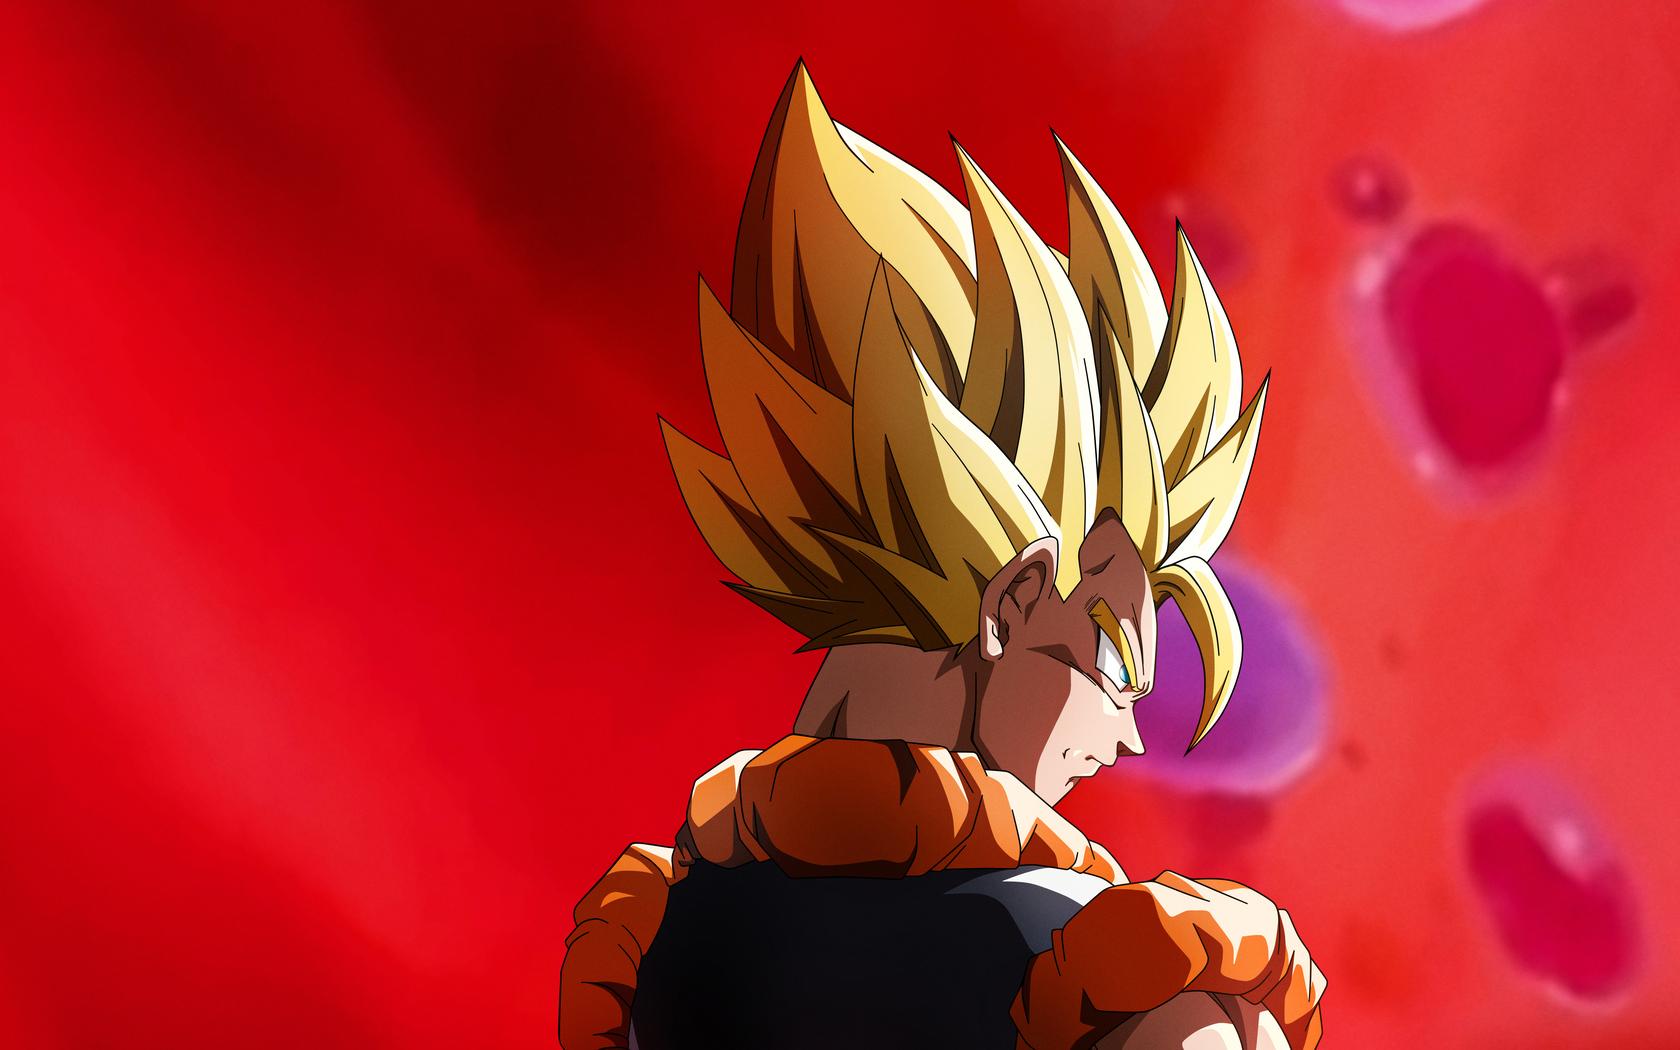 1680x1050 Dragon Ball Goku Ultra Instinct 5k 1680x1050 Resolution